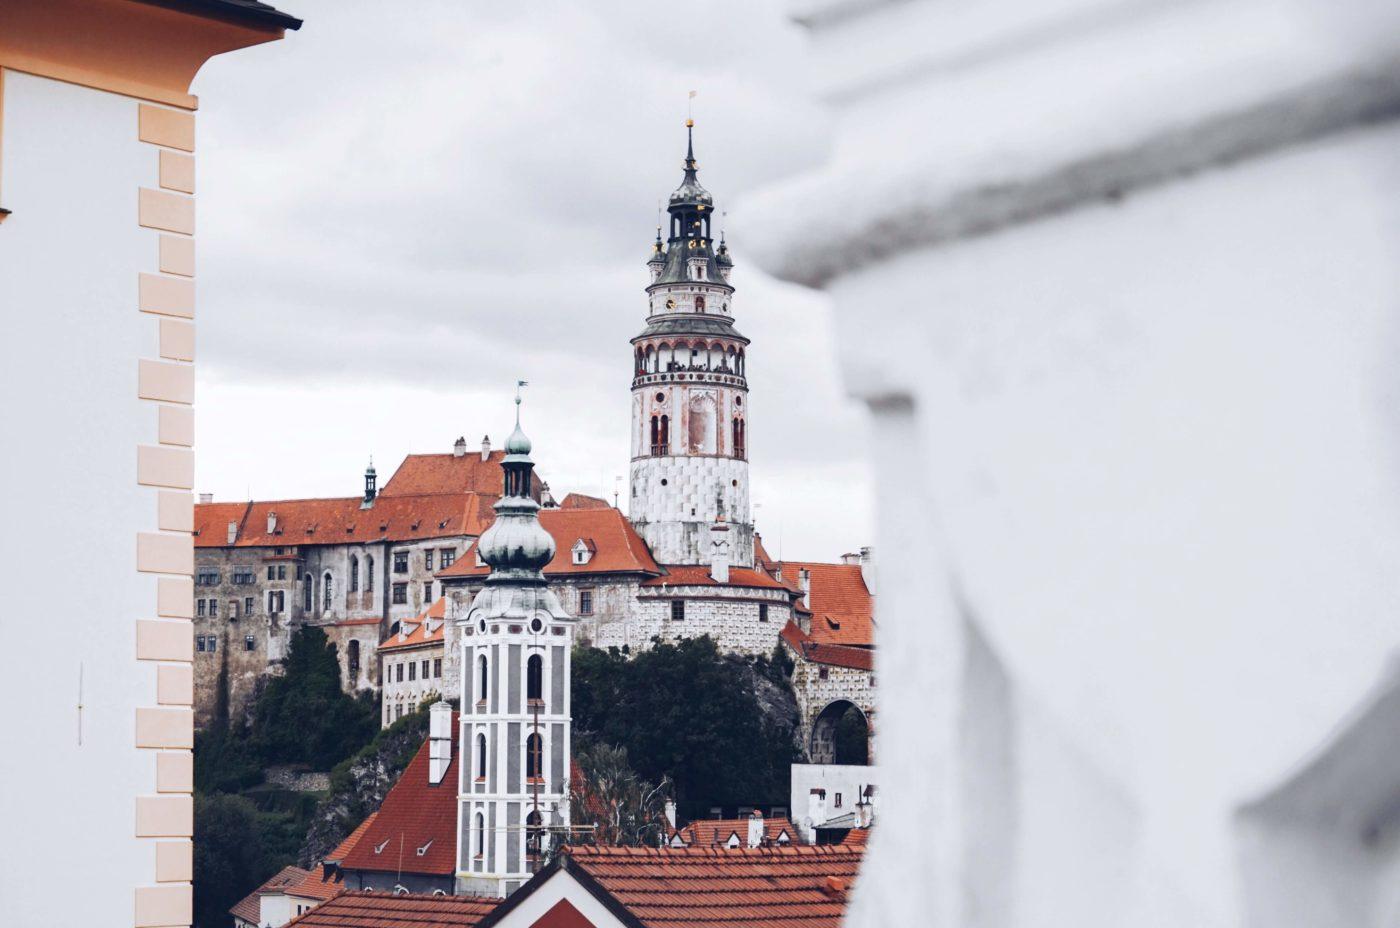 In the Czech Republic: Land of Stories beyond Prague